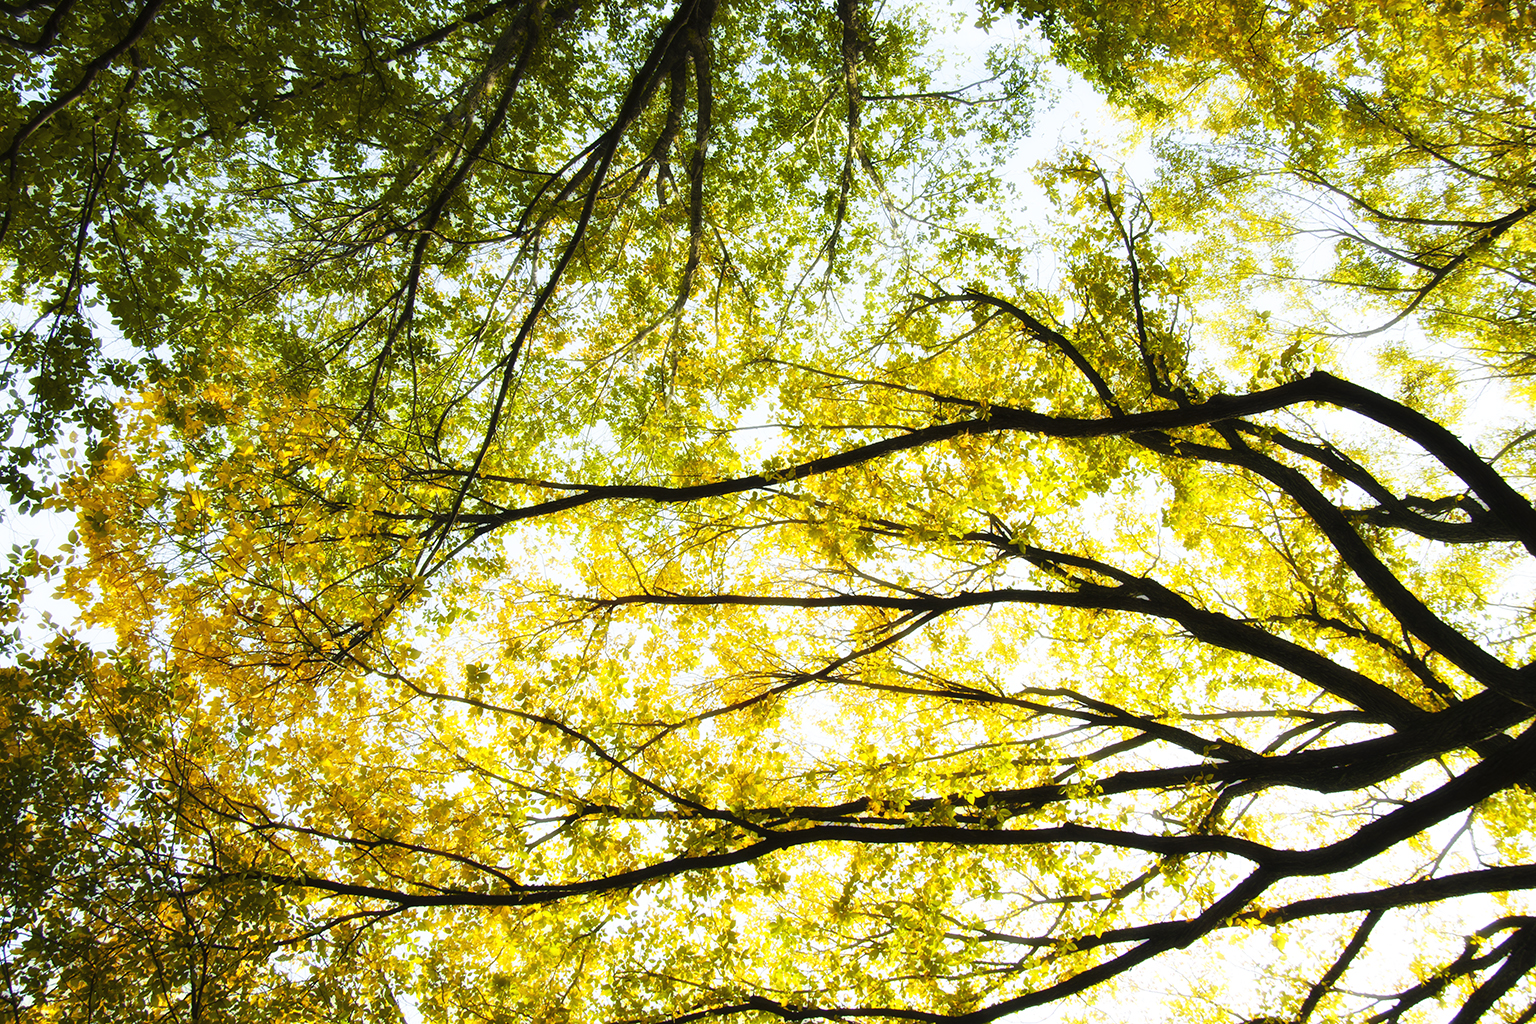 CENTRAL PARK TREES C